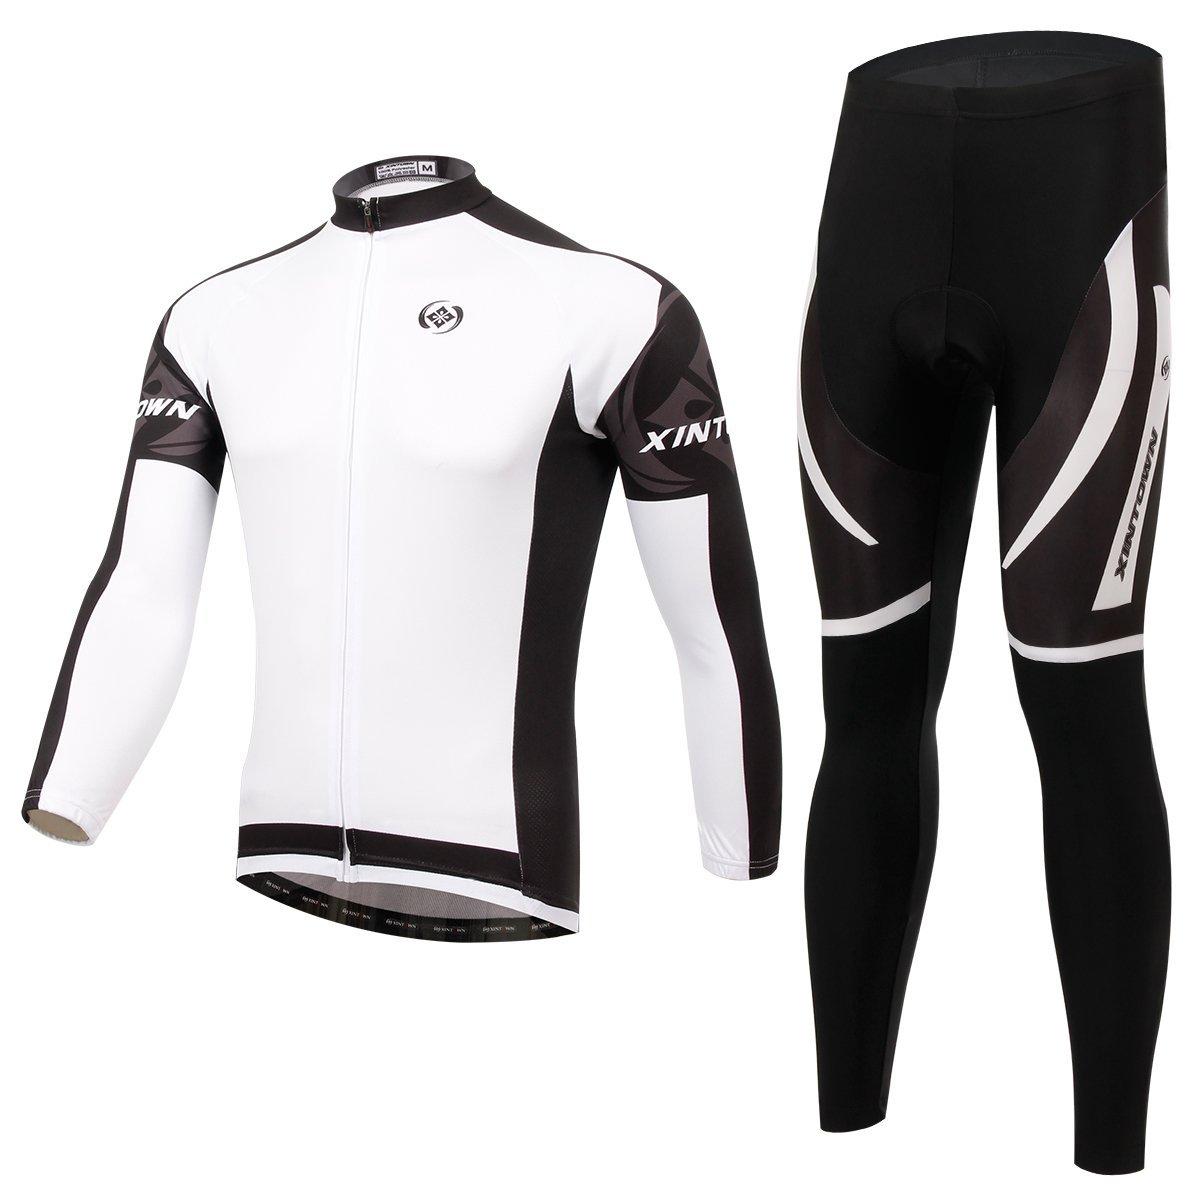 besylユニセックスホワイトブラックグレープリントハイパフォーマンスメッシュCycling Clothingキット、サイクリングジャージ半袖とショーツスーツ自転車用、バイカー、自転車、乗馬 B0189KTV2U XXXL (US XXL) Fleece Fleece XXXL (US XXL)